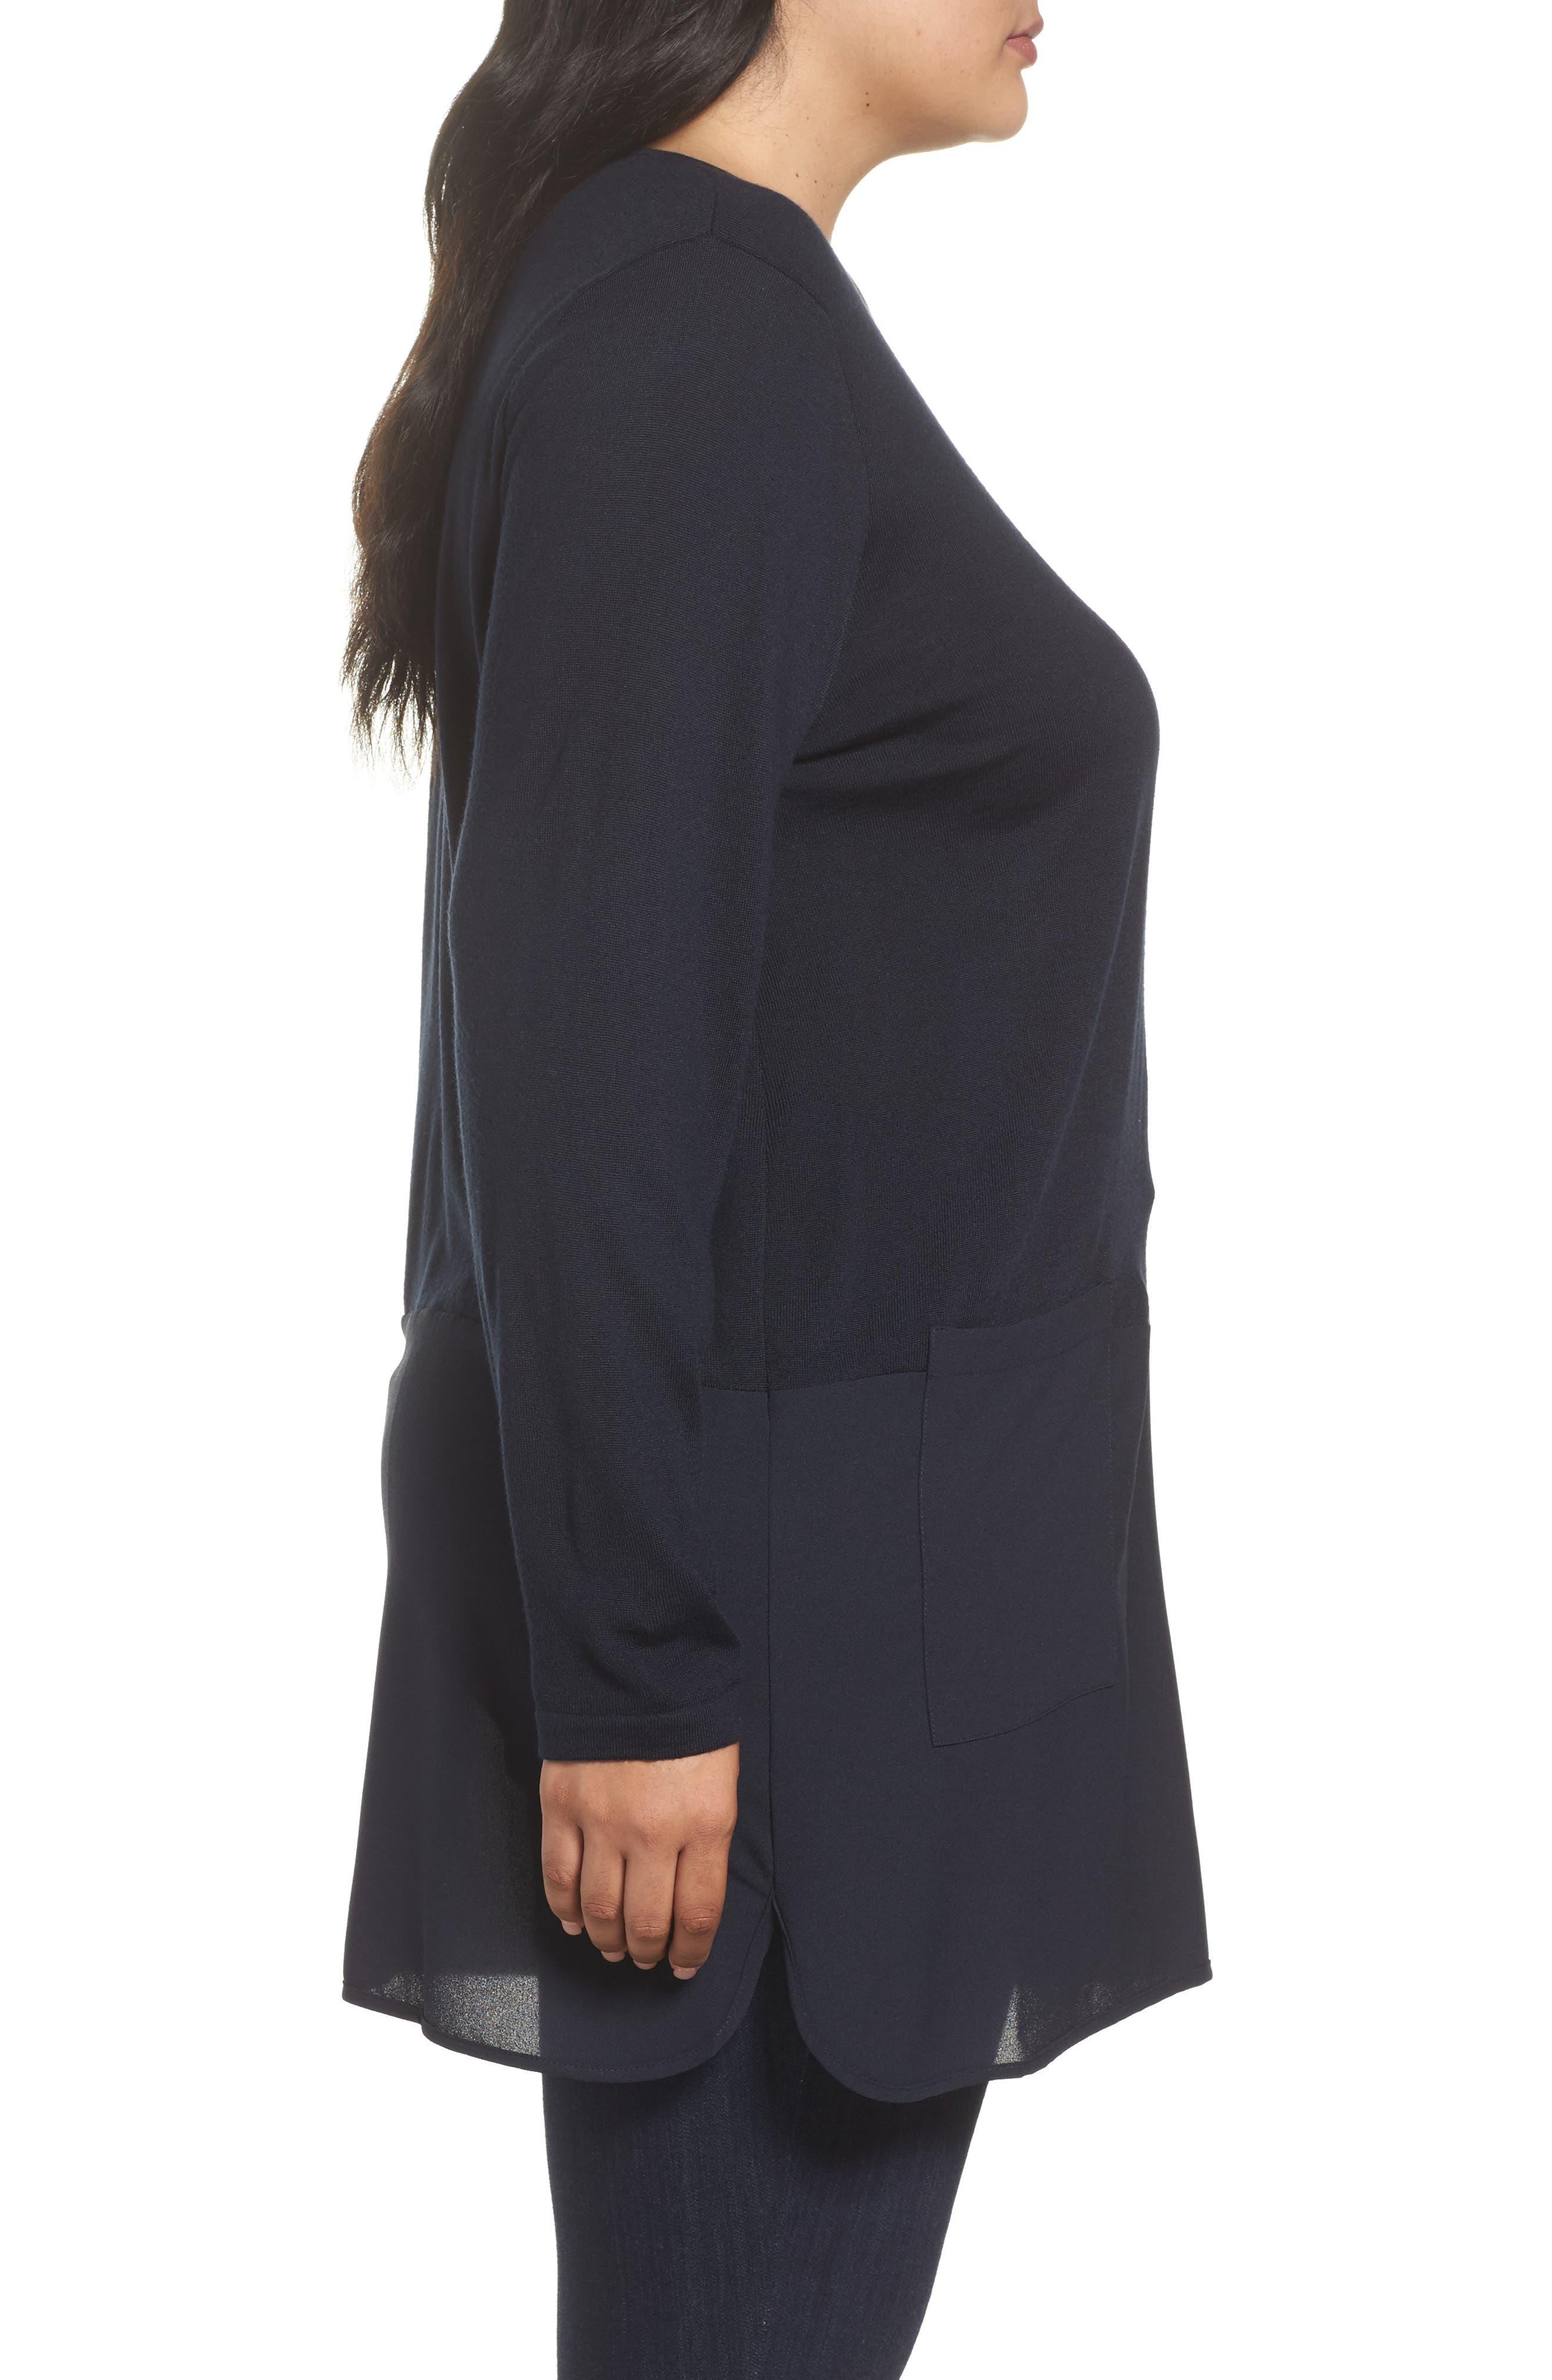 Alternate Image 3  - Persona by Marina Rinaldi Adamo MIxed Media Sweater (Plus Size)